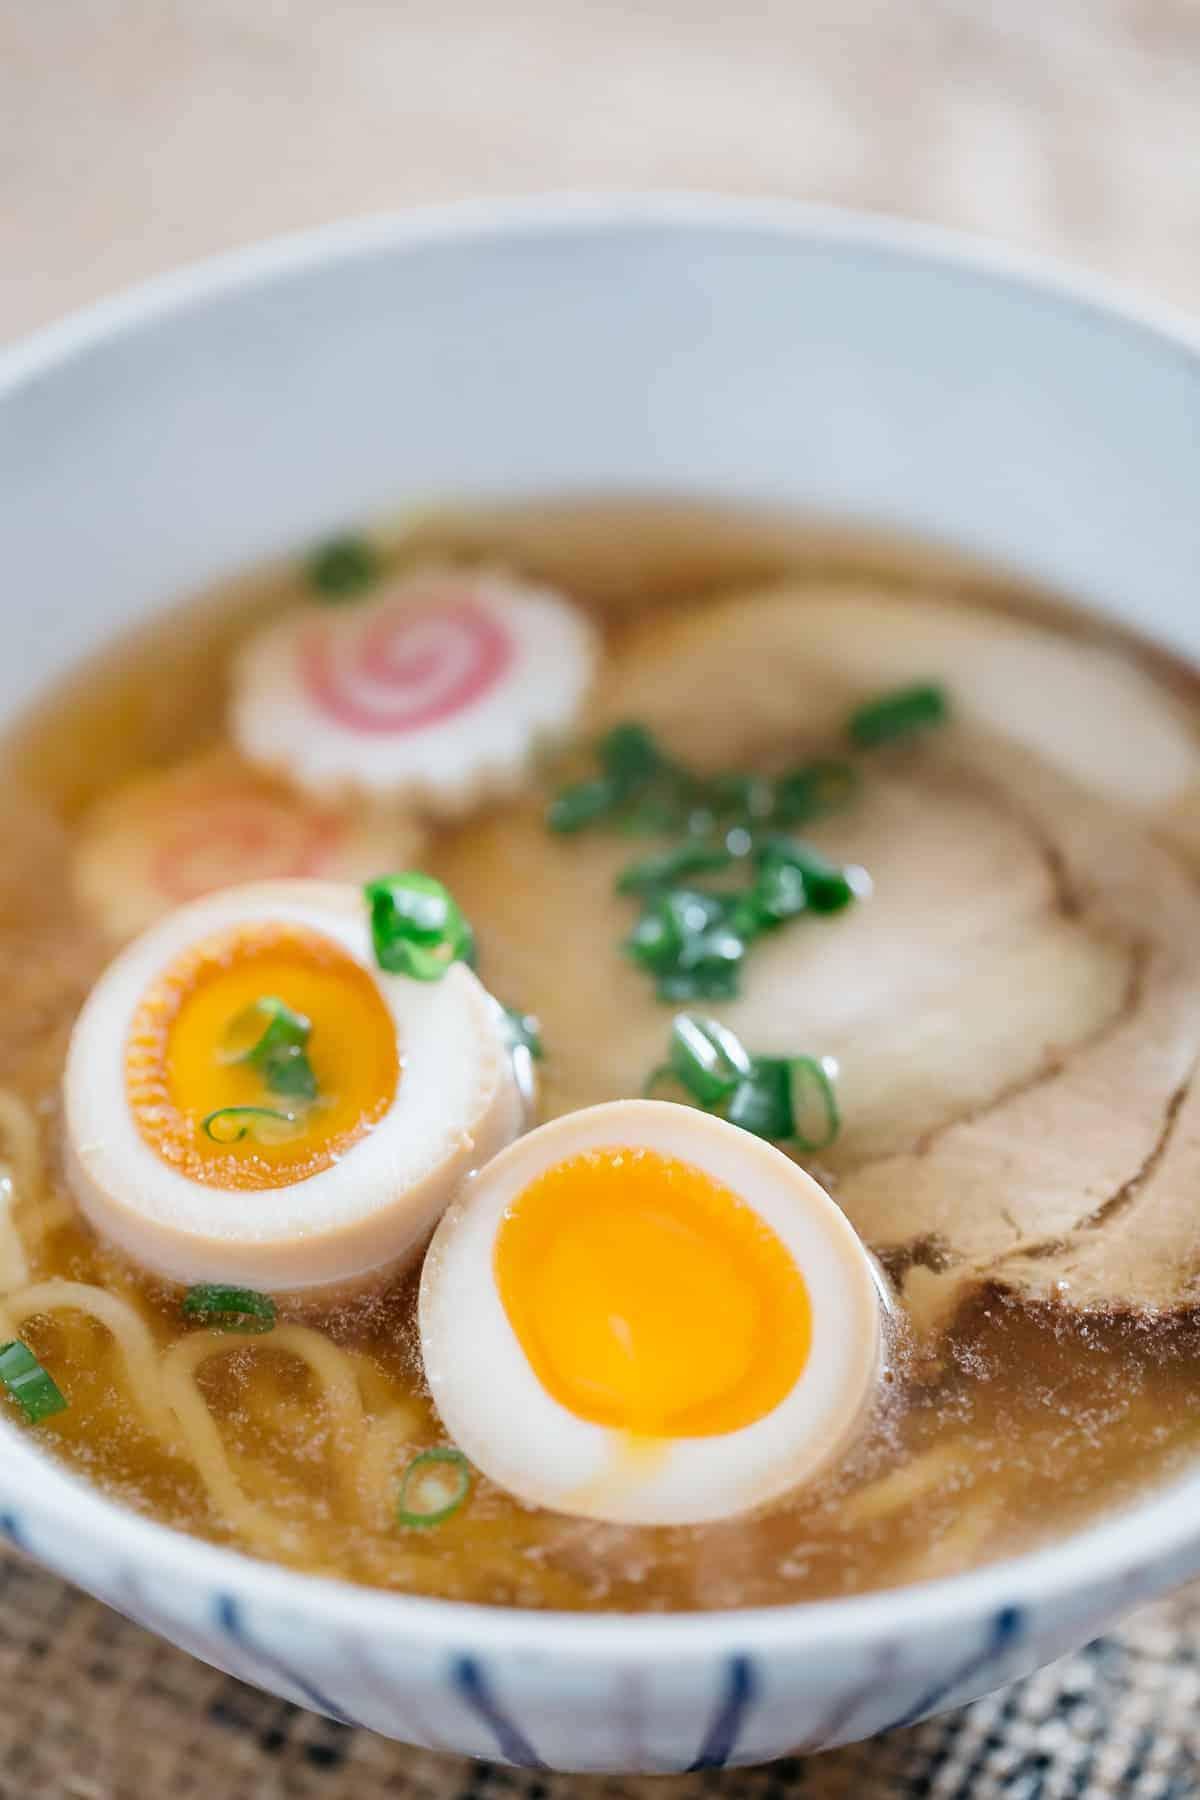 Ramen egg served in ramen